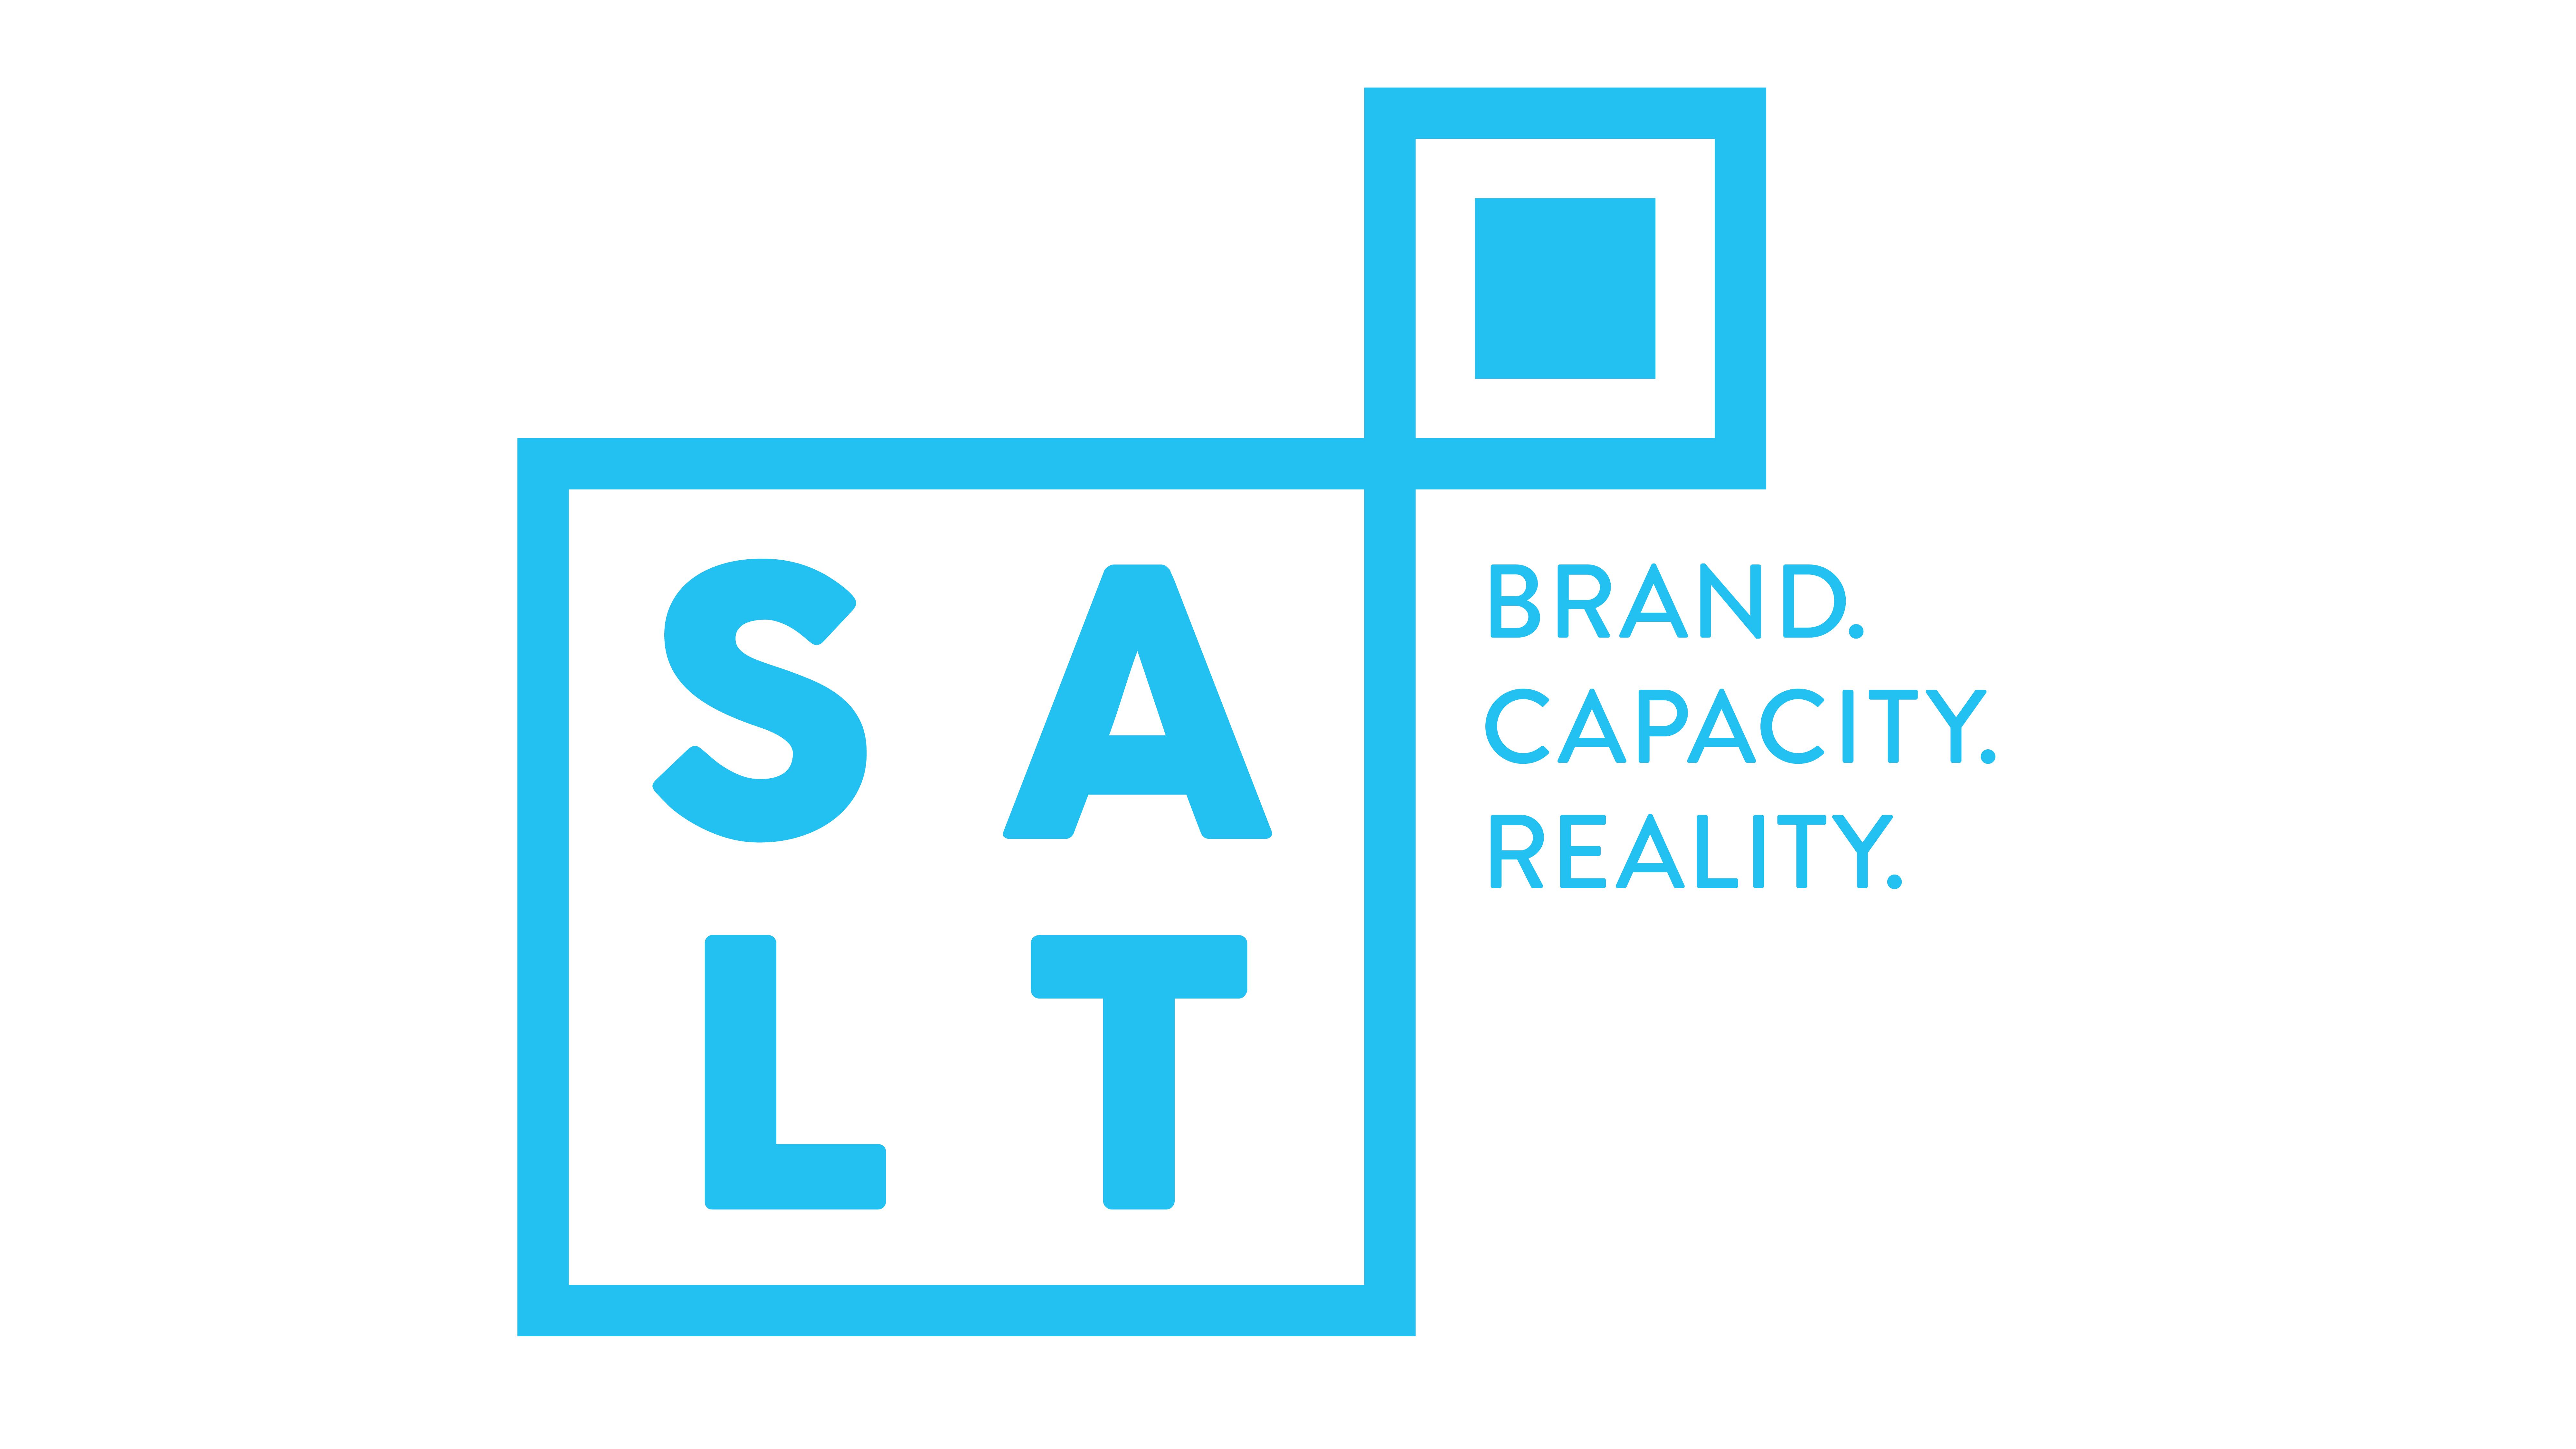 Salt+%C4%B0leti%C5%9Fim+Grup%E2%80%99a+yeni+m%C3%BC%C5%9Fteri